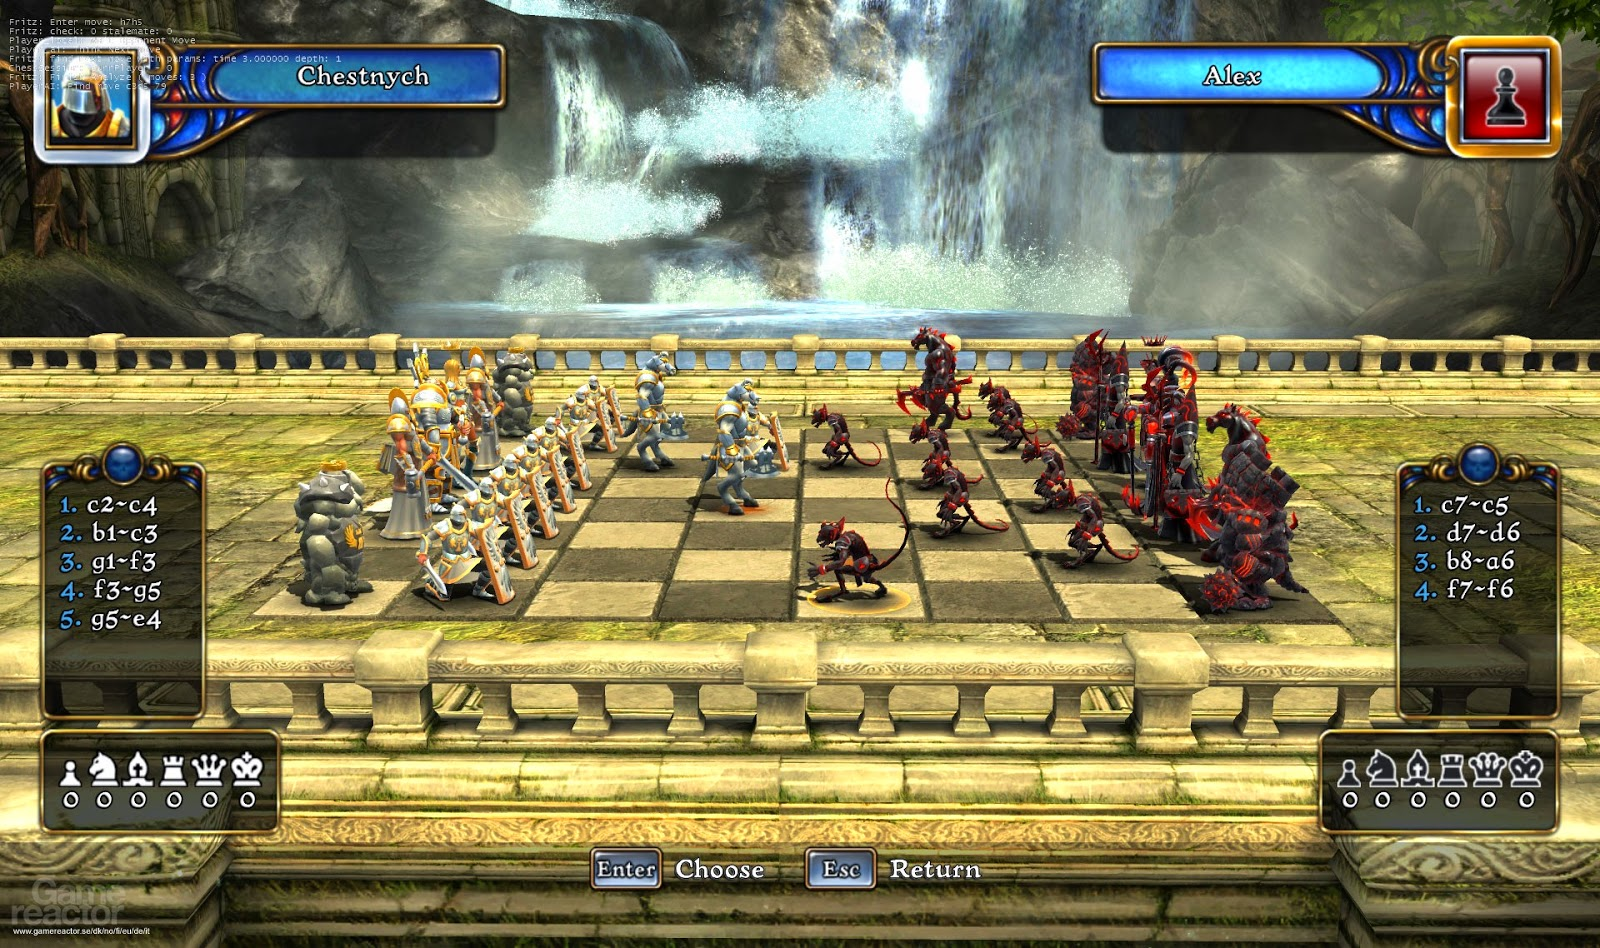 4 way chess online 2 lights 1 switch wiring diagram battle vs pc full free download yusran games